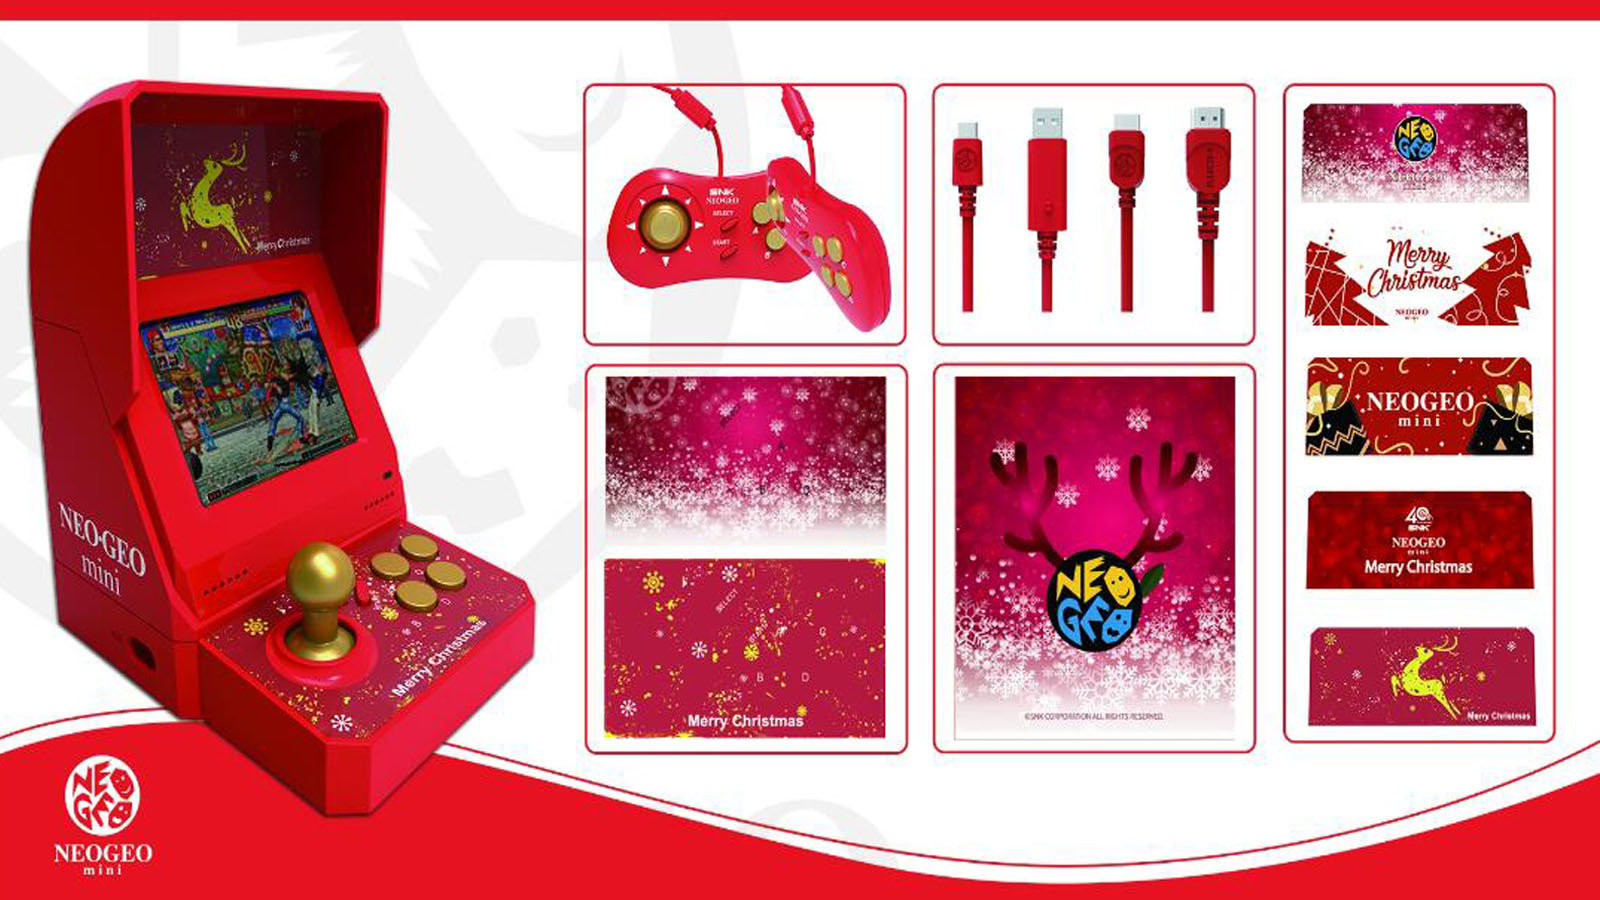 SNK推出NeoGeo mini圣诞限定版,全球限量15000台